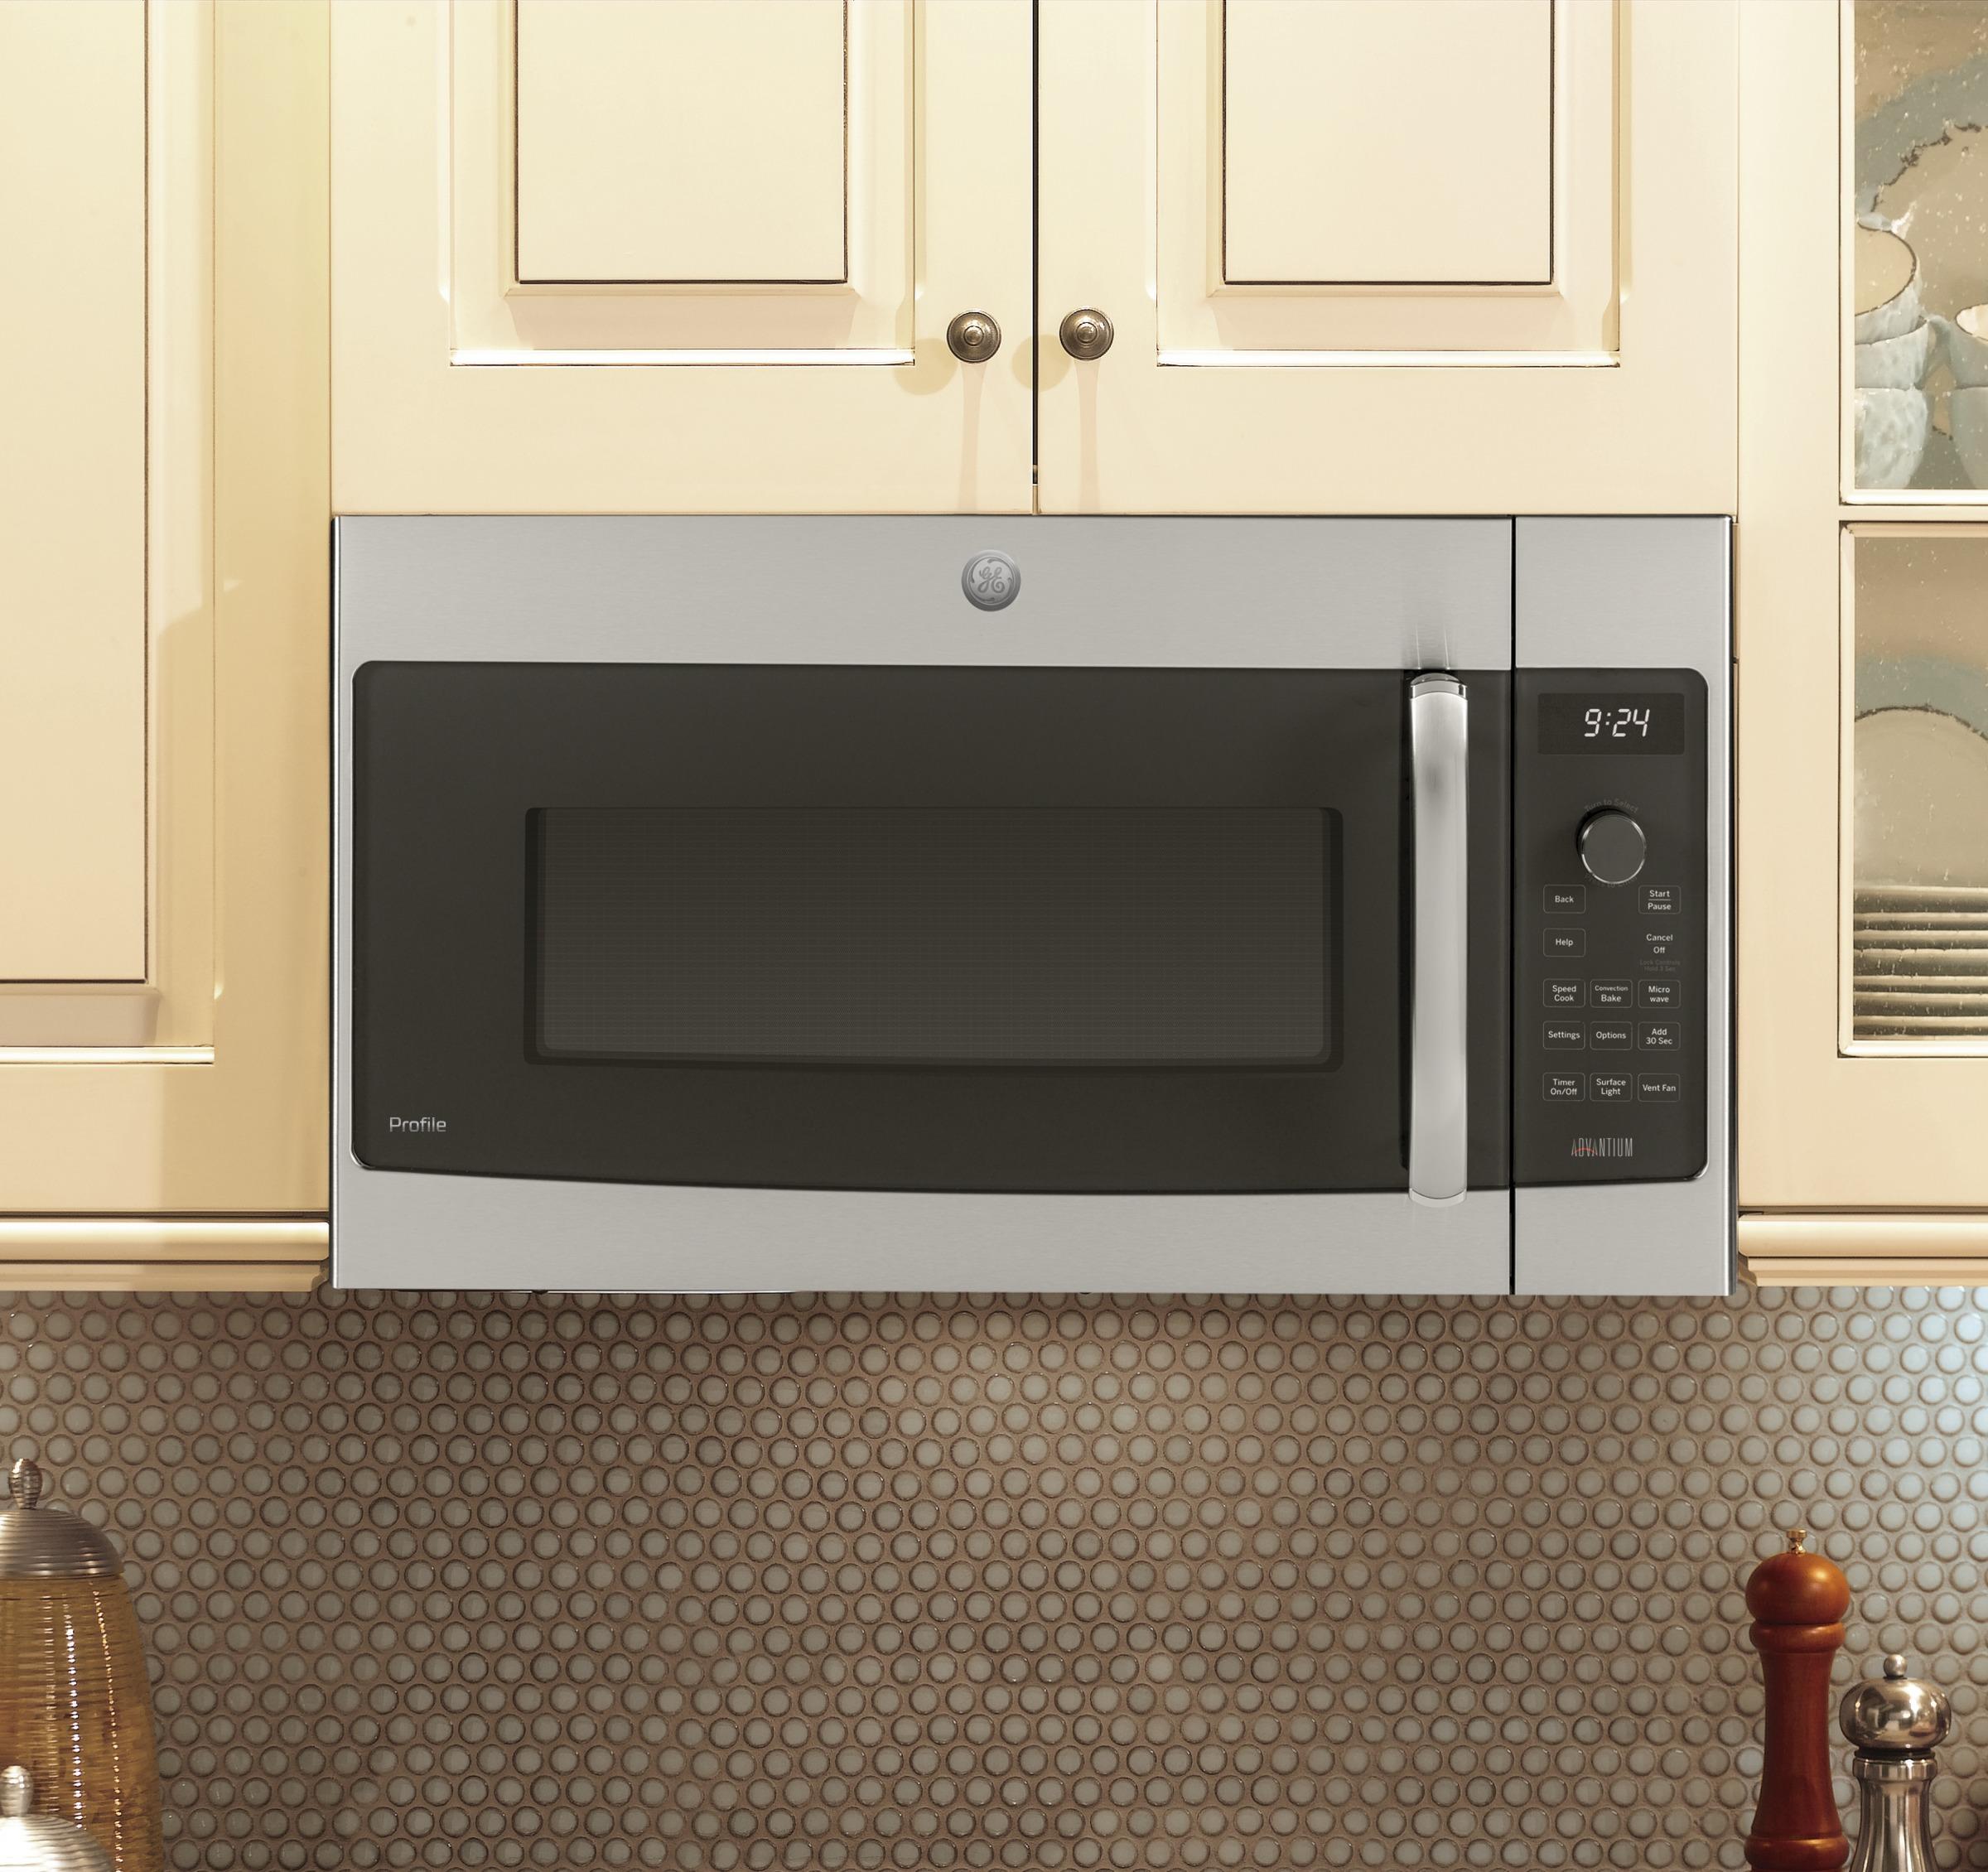 Model: PSA9240SFSS | GE Profile Series Over-the-Range Oven with Advantium® Technology